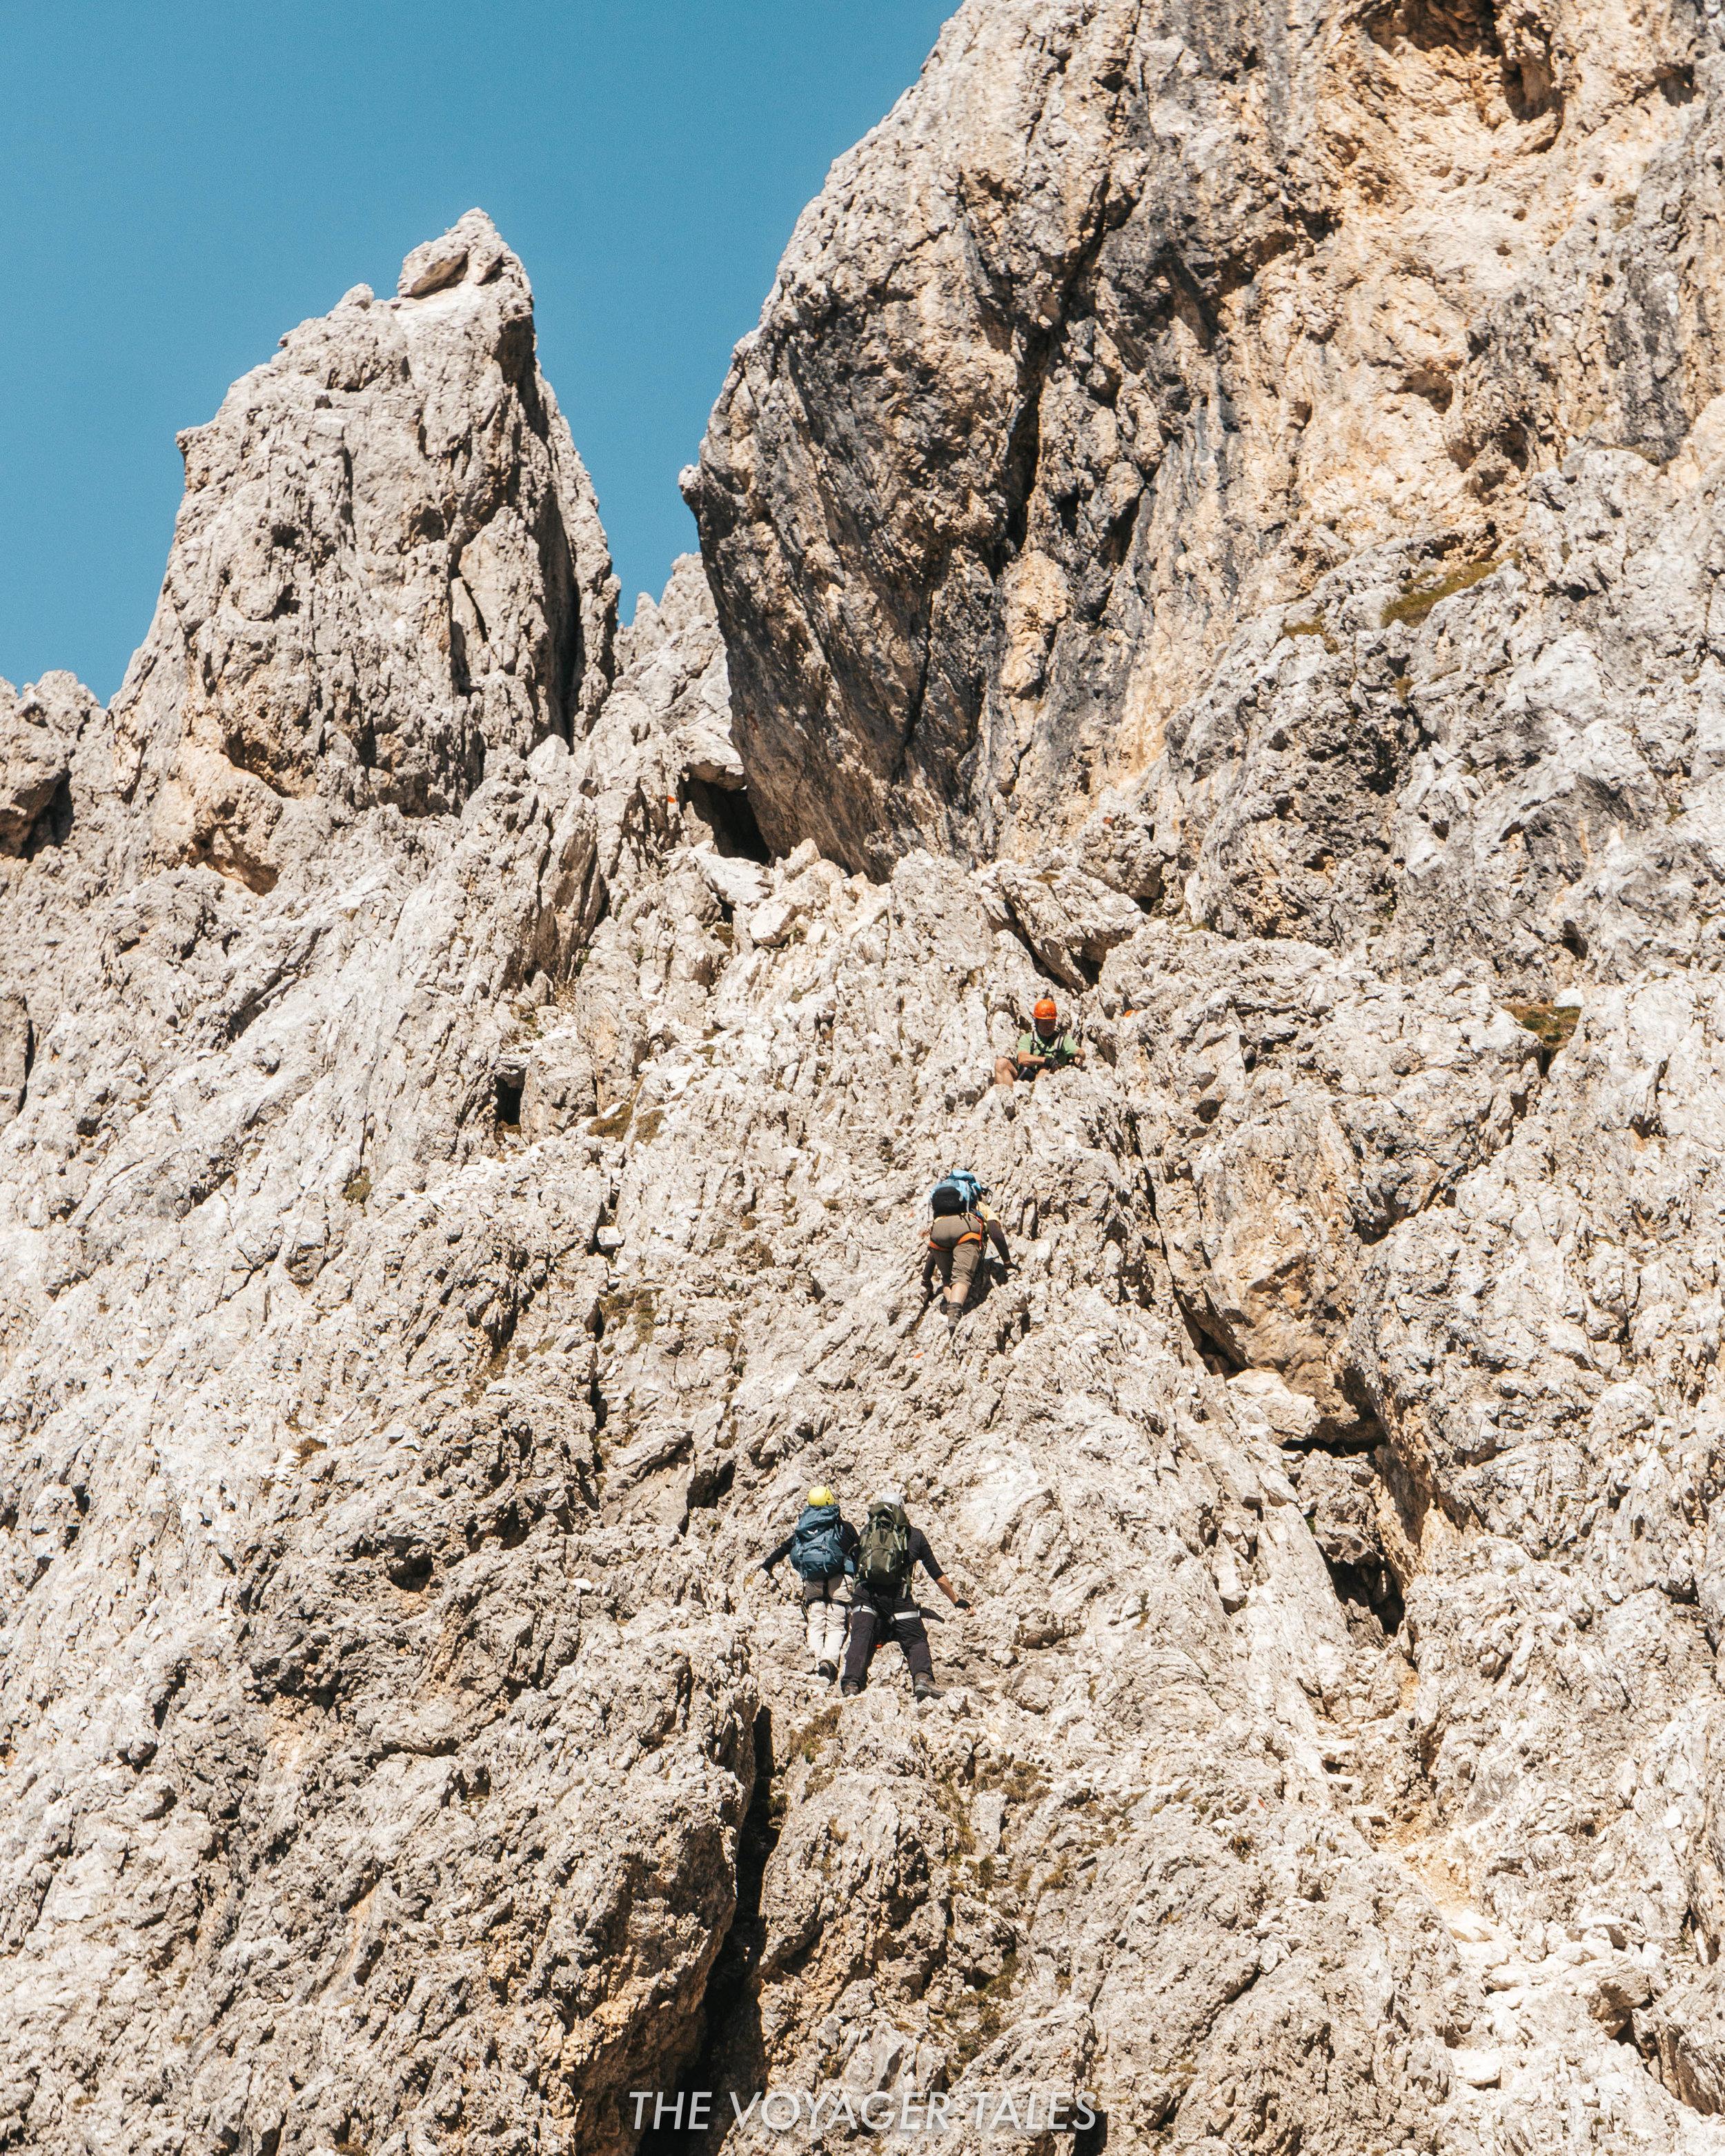 Via Feratta Passo Santner in the Rosengarten Mountains, Italy